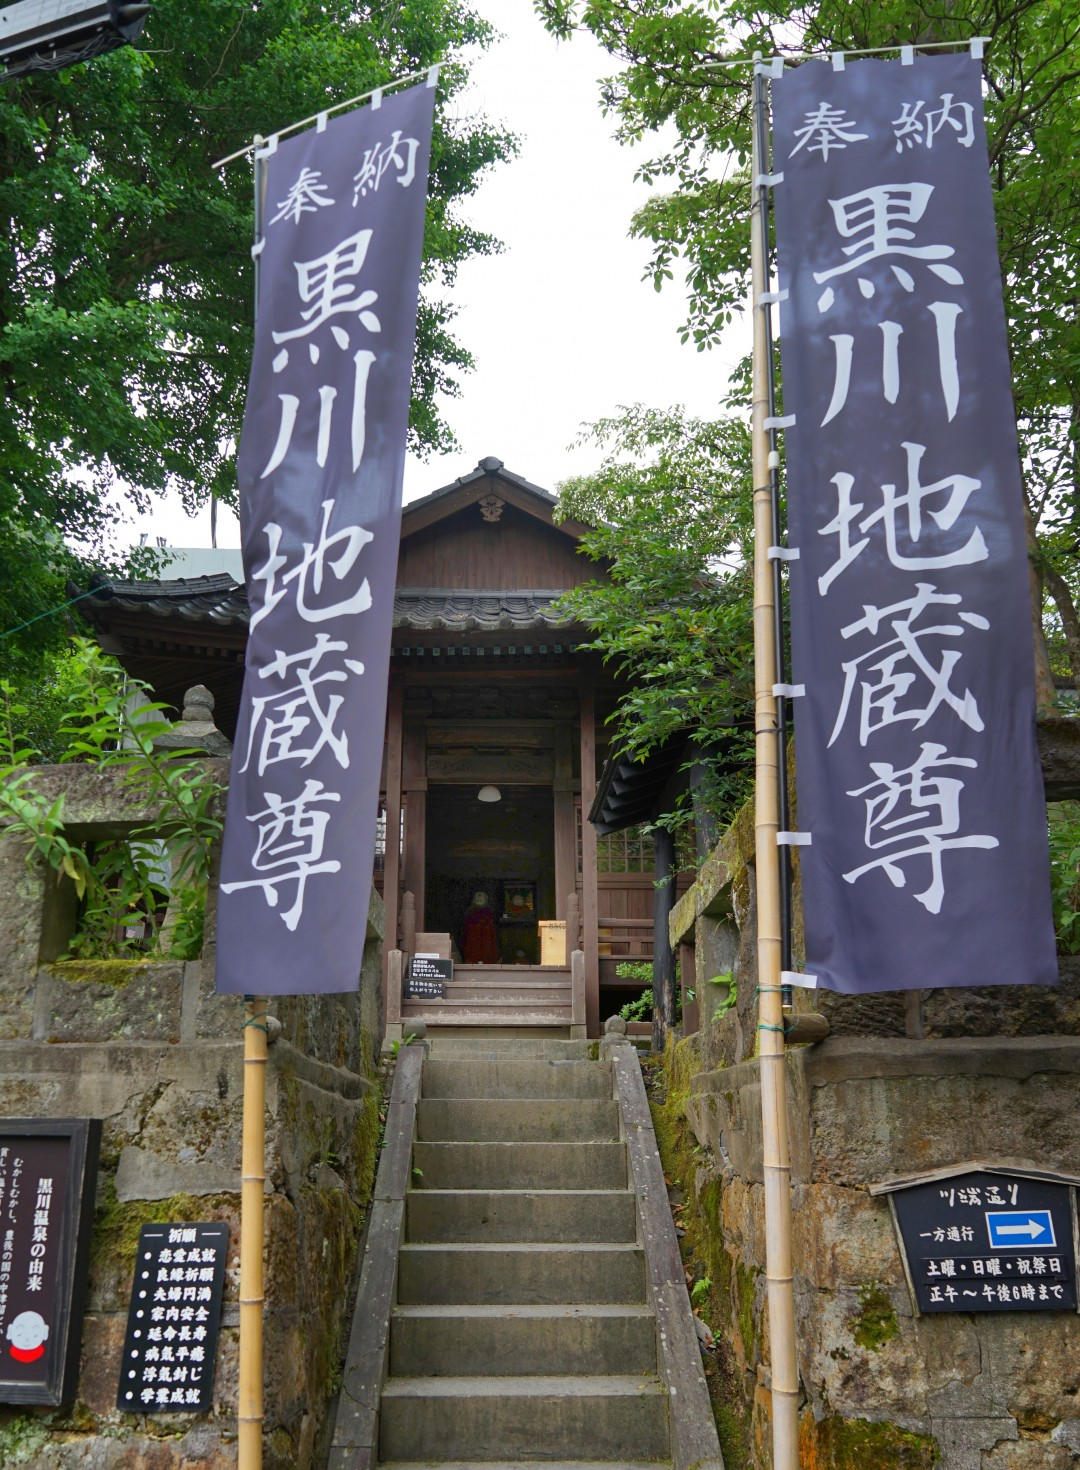 kurogawa_13.JPG